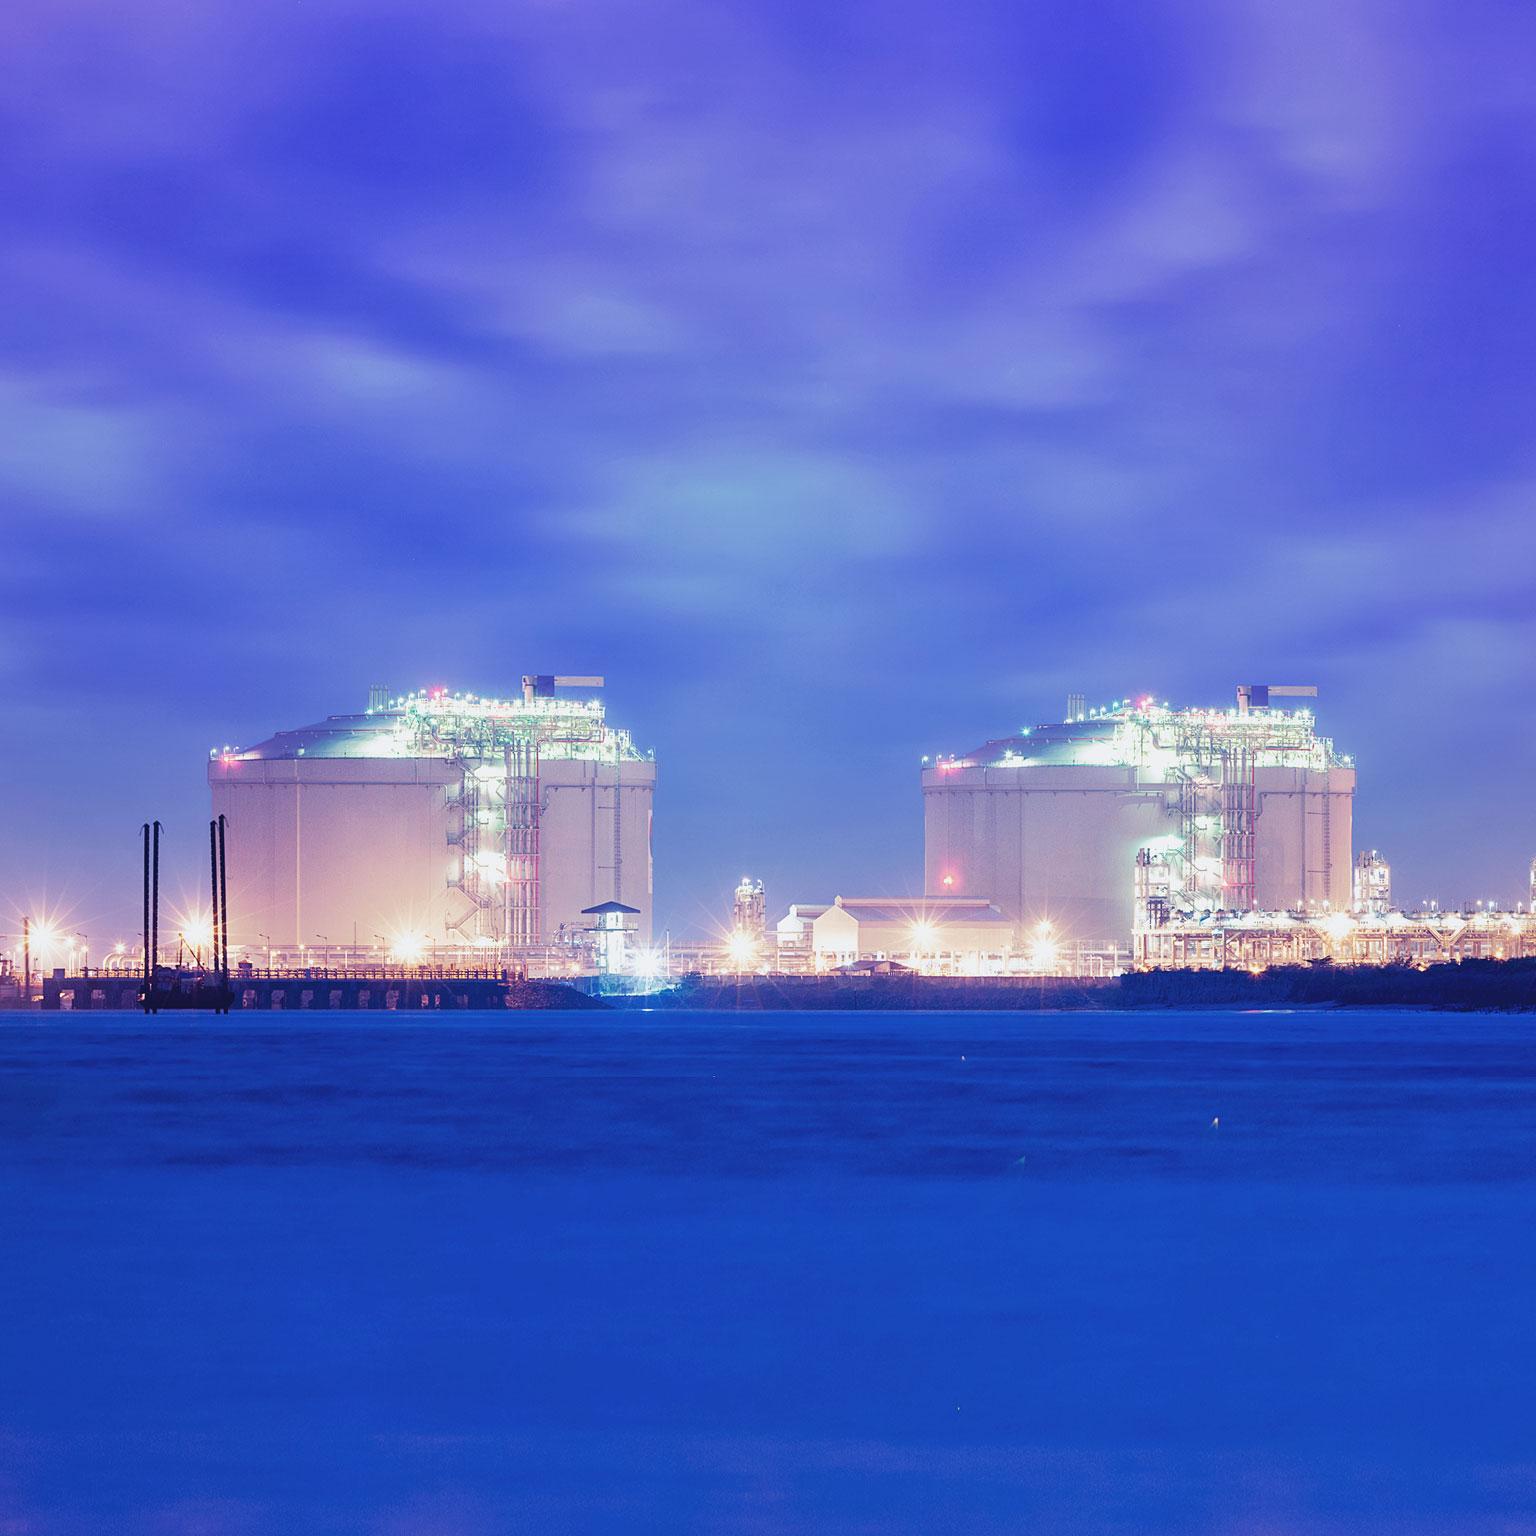 W|EPC: Golden Pass LNG – Q421 Project Update